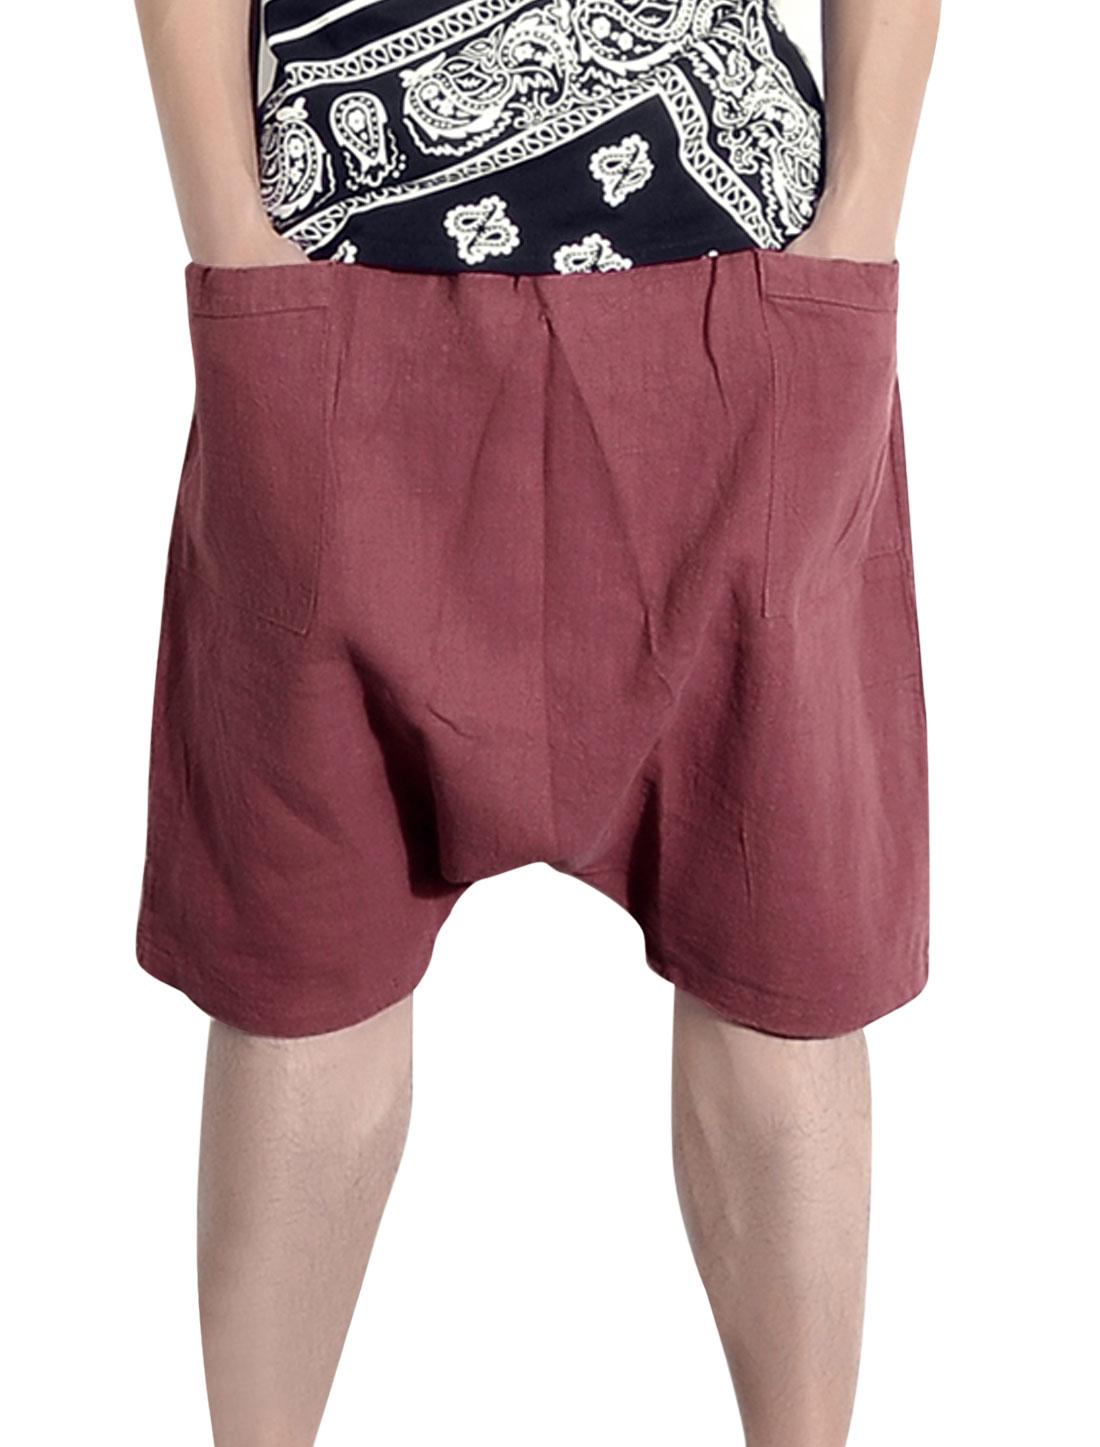 Stretchy Waist Patch Pcokets Cozy Fit Harem Shorts for Men Light Burgundy W30